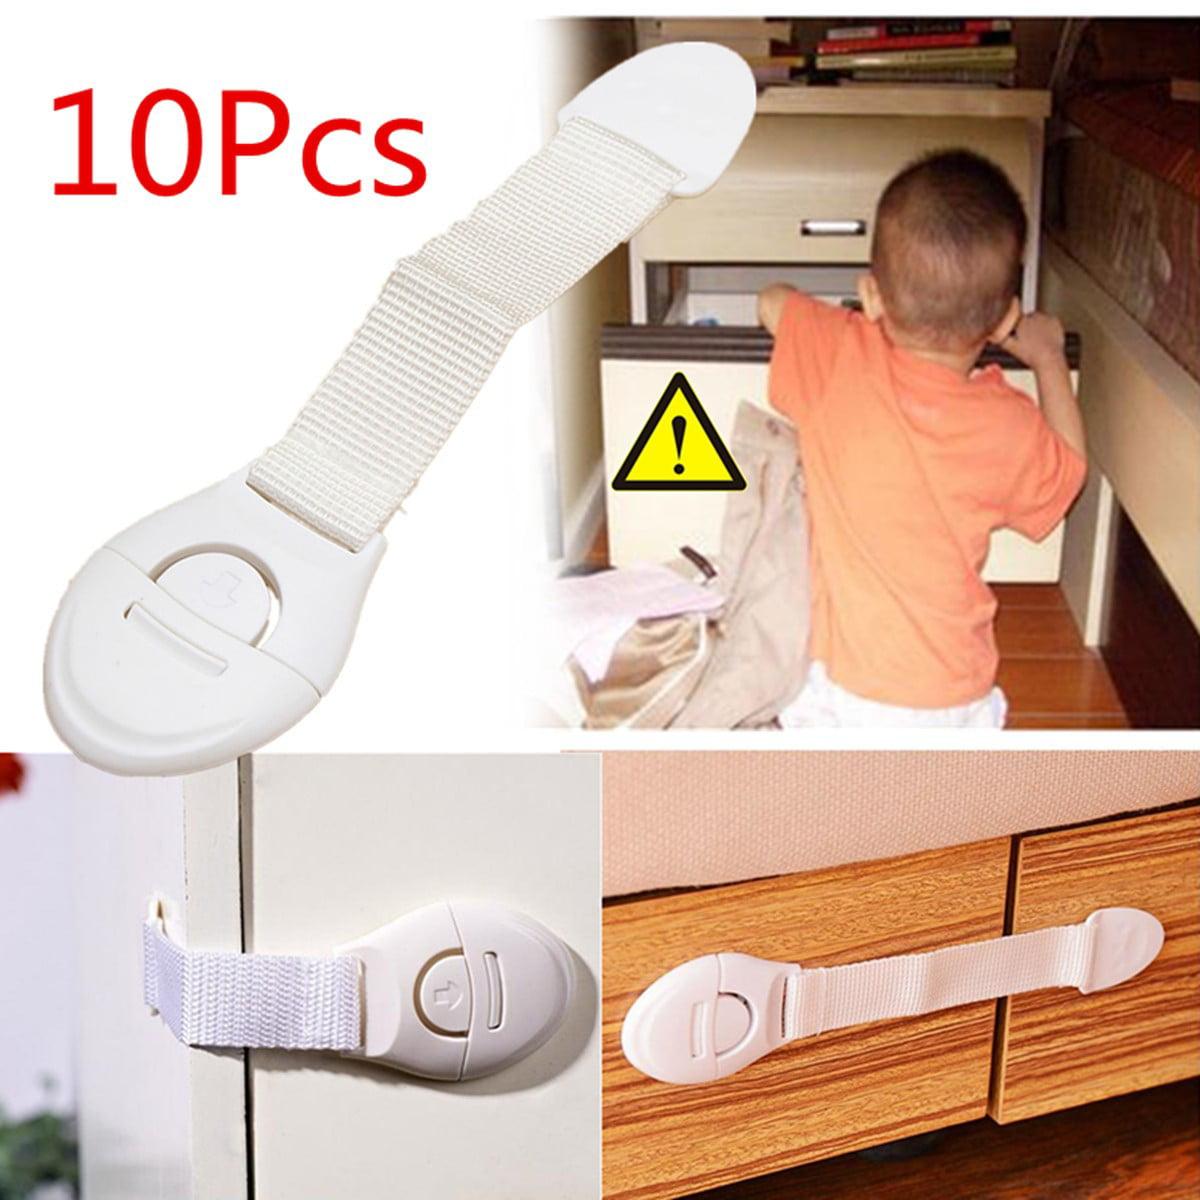 10PCS Child Baby Safety Cupboard Cabinet Locks Pet Proofing Door Drawer Fridge